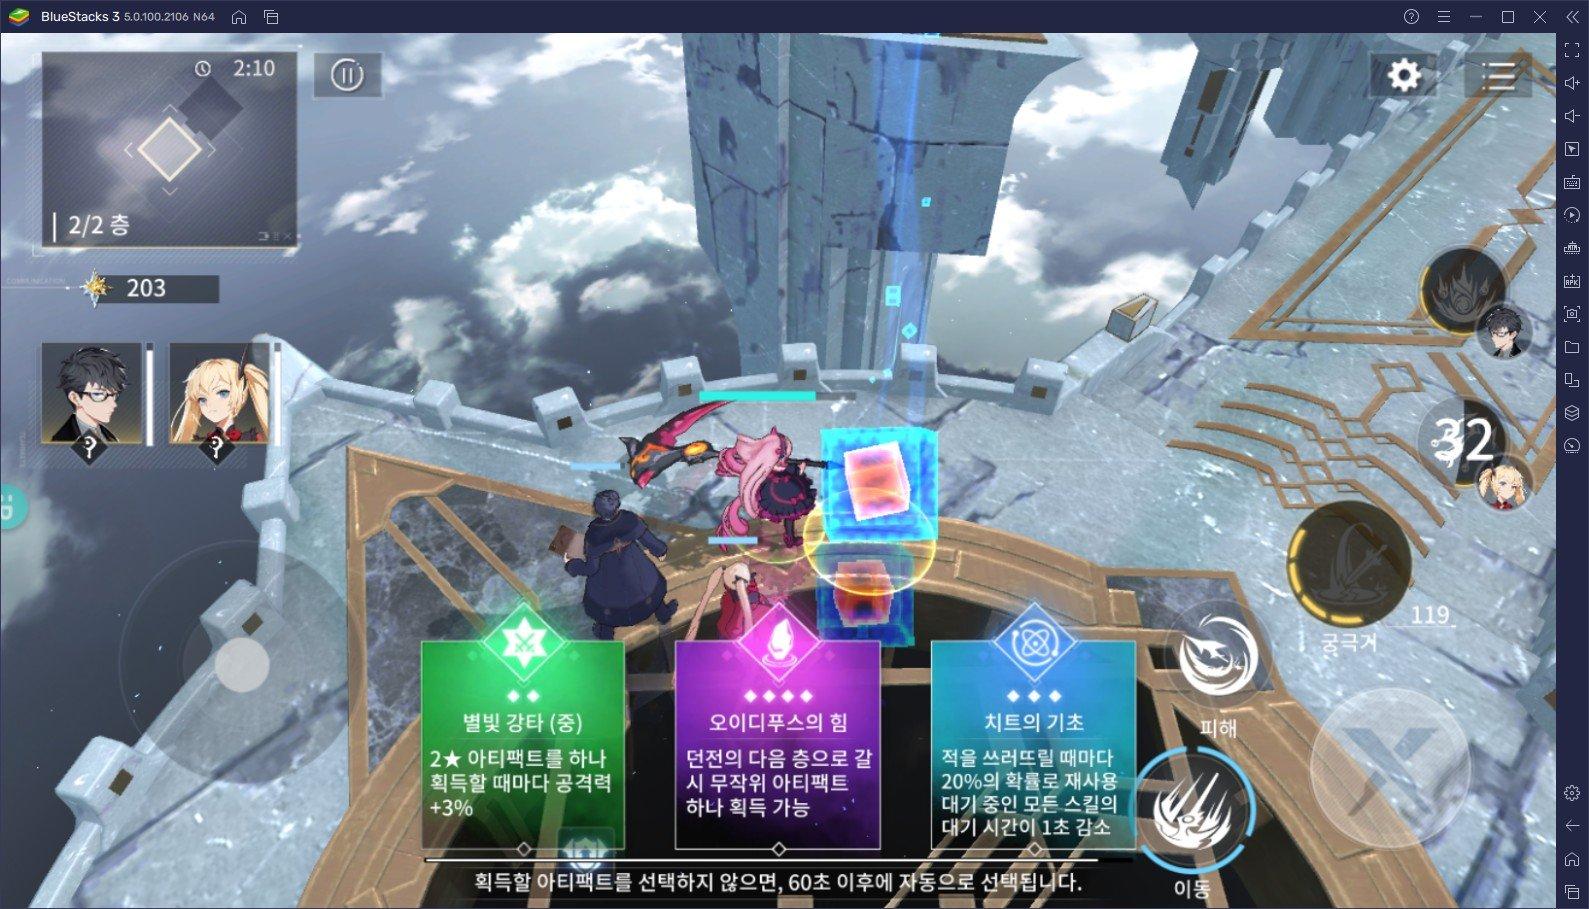 X2: 이클립스 드디어 오픈! 액션 RPG의 재미를 블루스택 앱플레이어로 PC에서 제대로 느껴보세요!